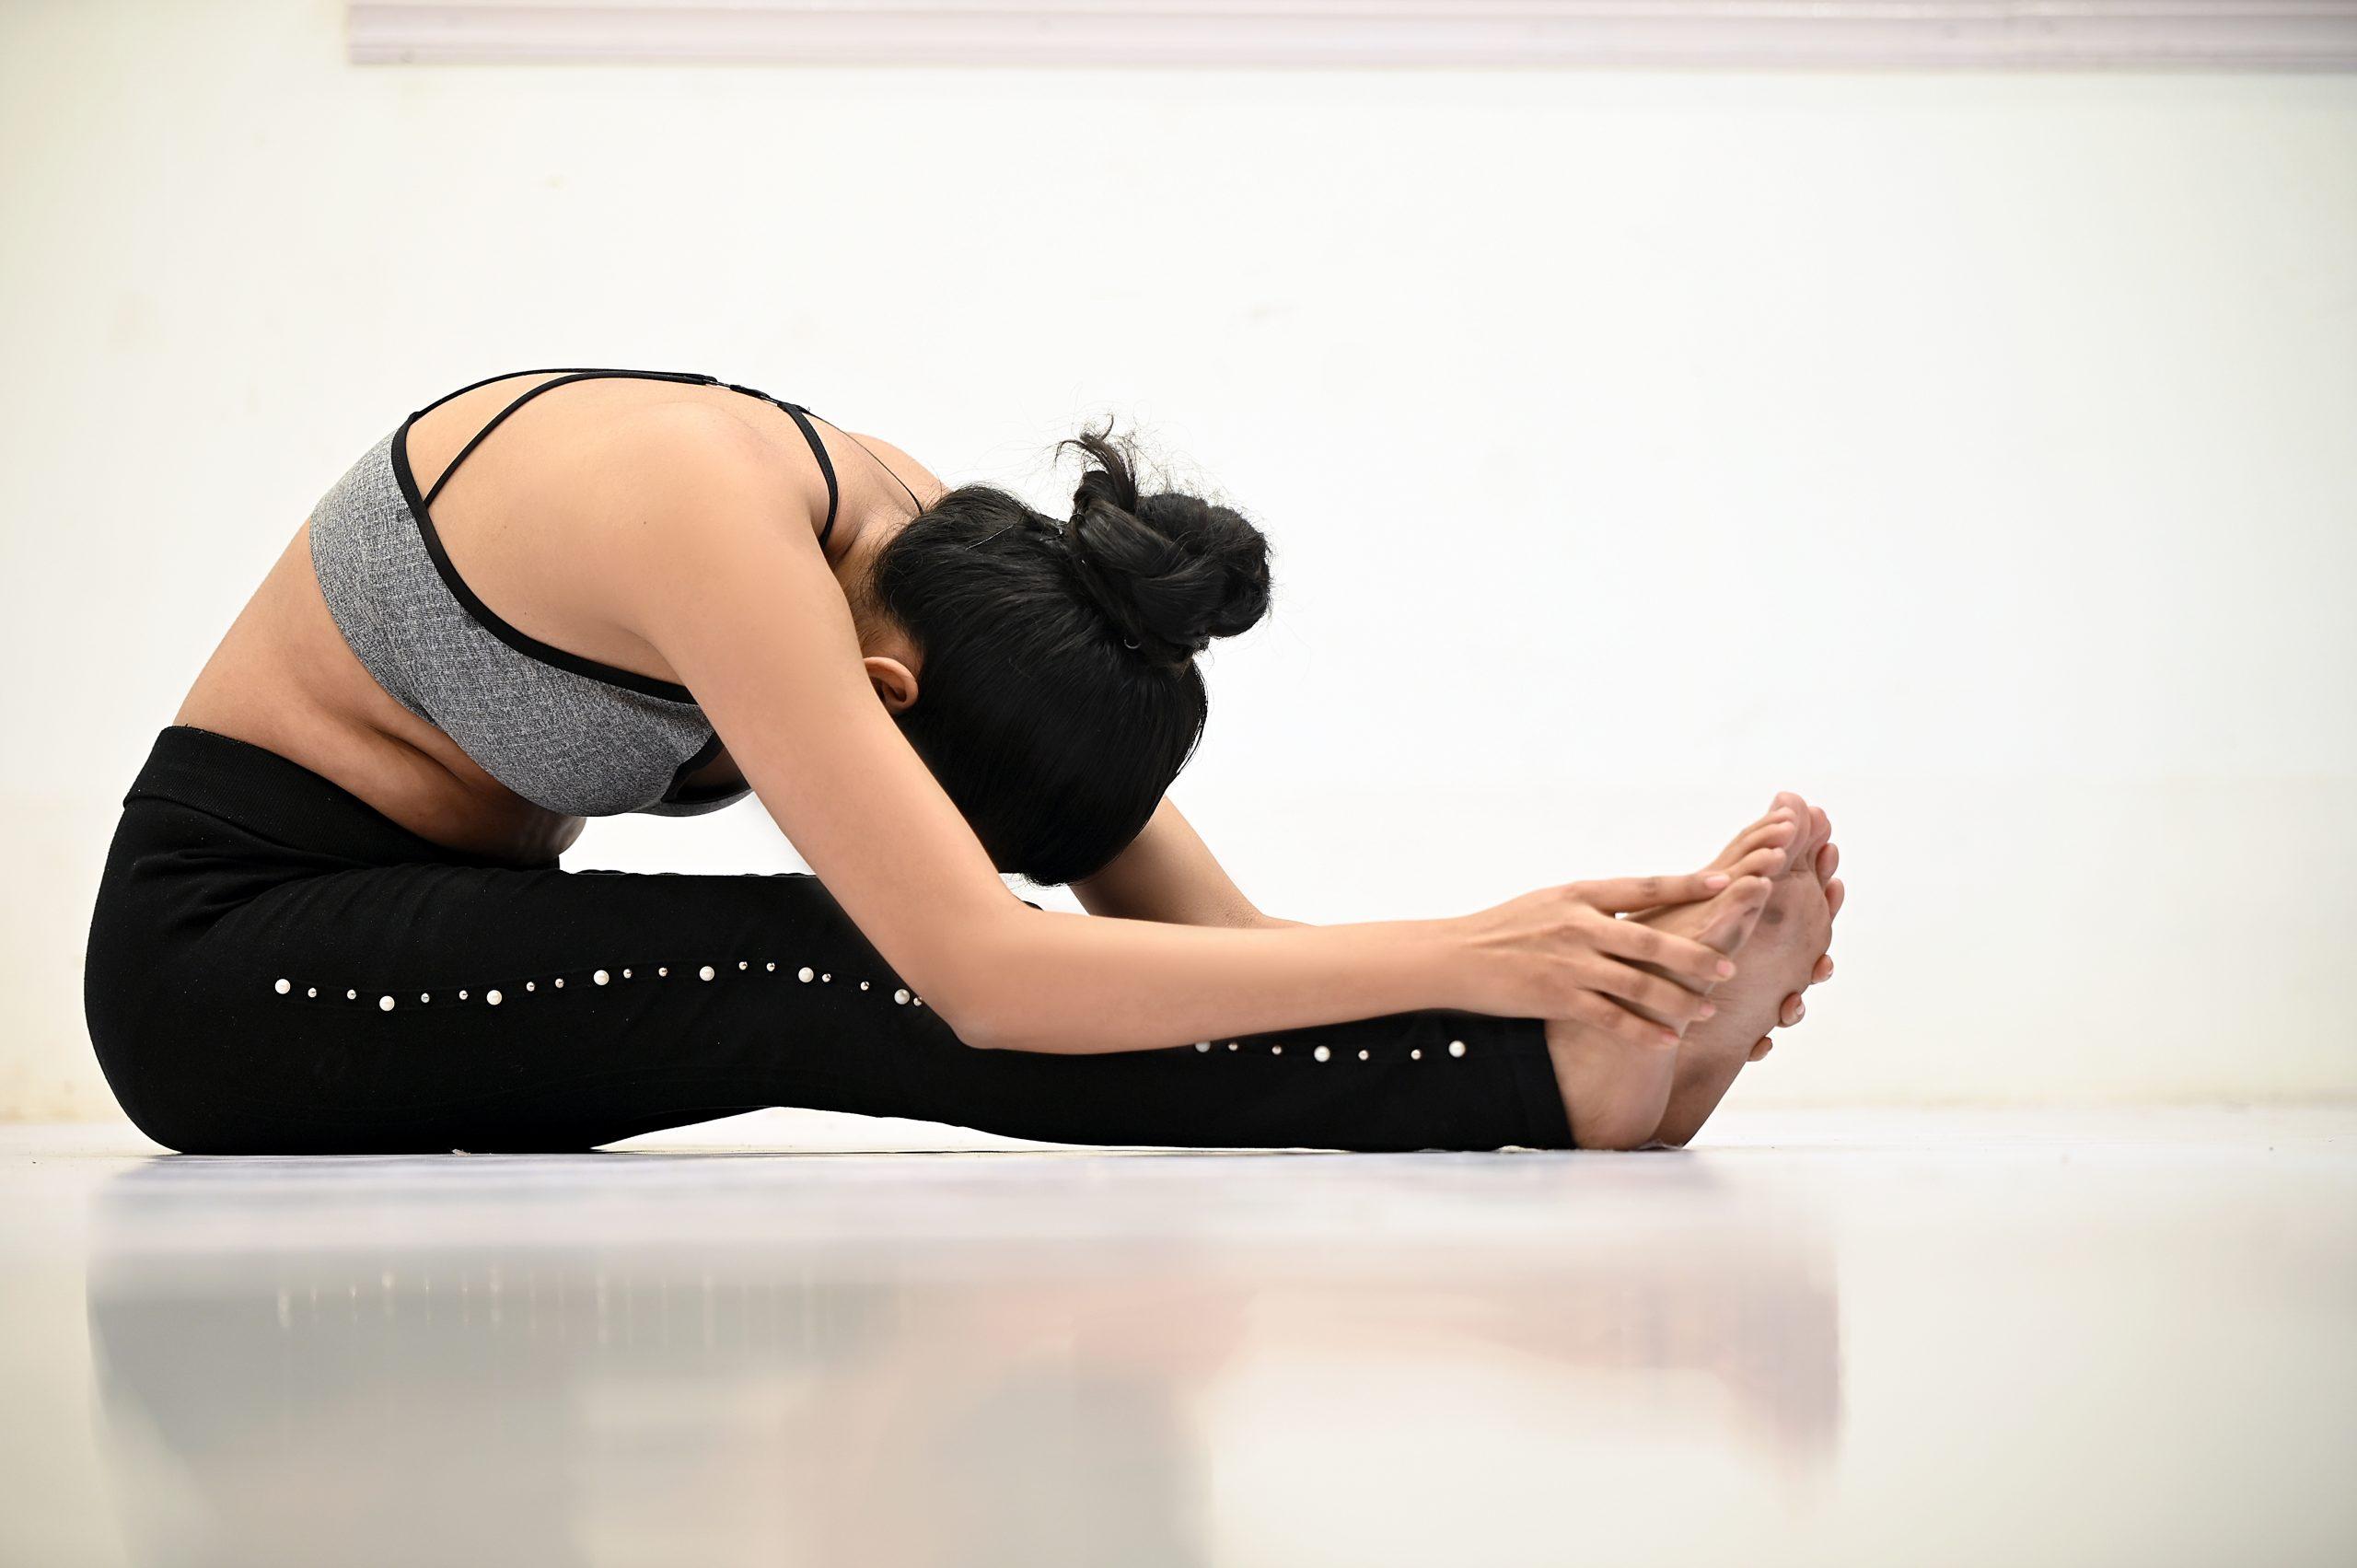 Girl stretching her body